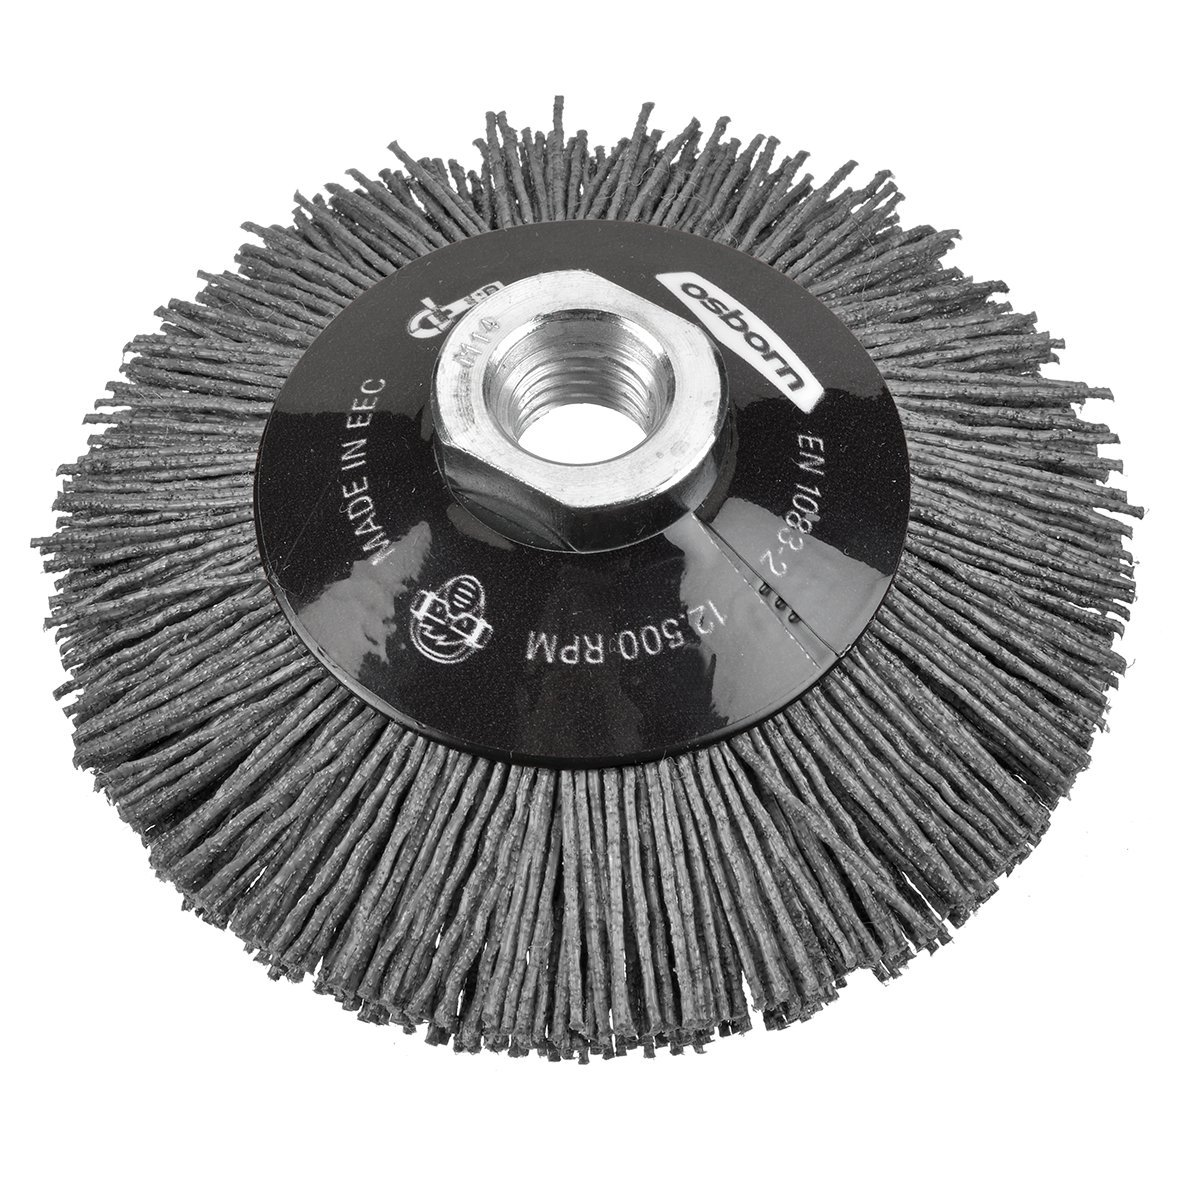 Osborn novedad Cono Cepillo para baterí a Amoladora de á ngulo (115 mm, 1 pieza, 6802622891 1pieza Osborn International GmbH